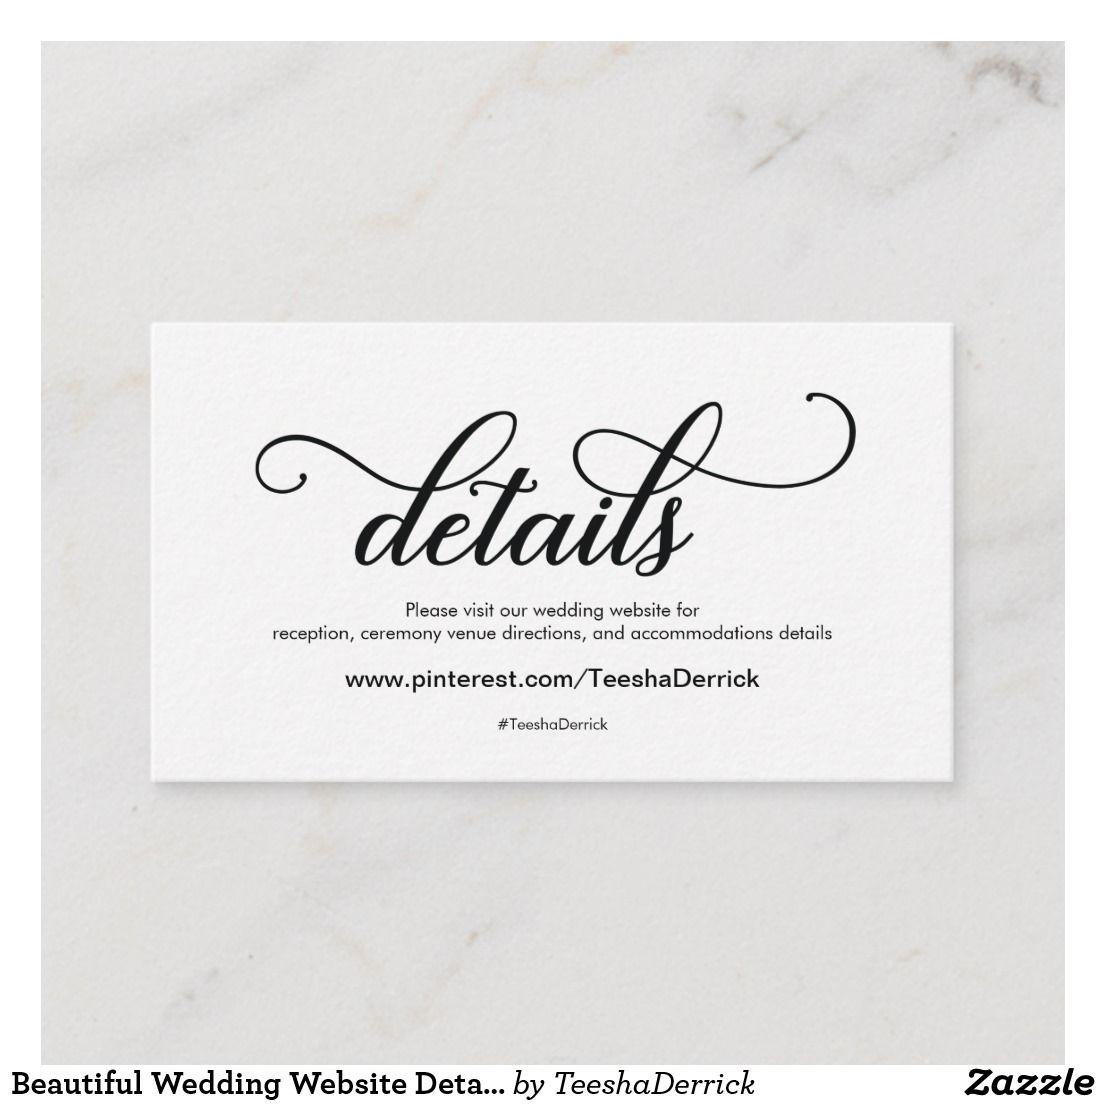 Beautiful Wedding Website Details Enclosure Card Zazzle Com Wedding Website Beautiful Weddings Website Details